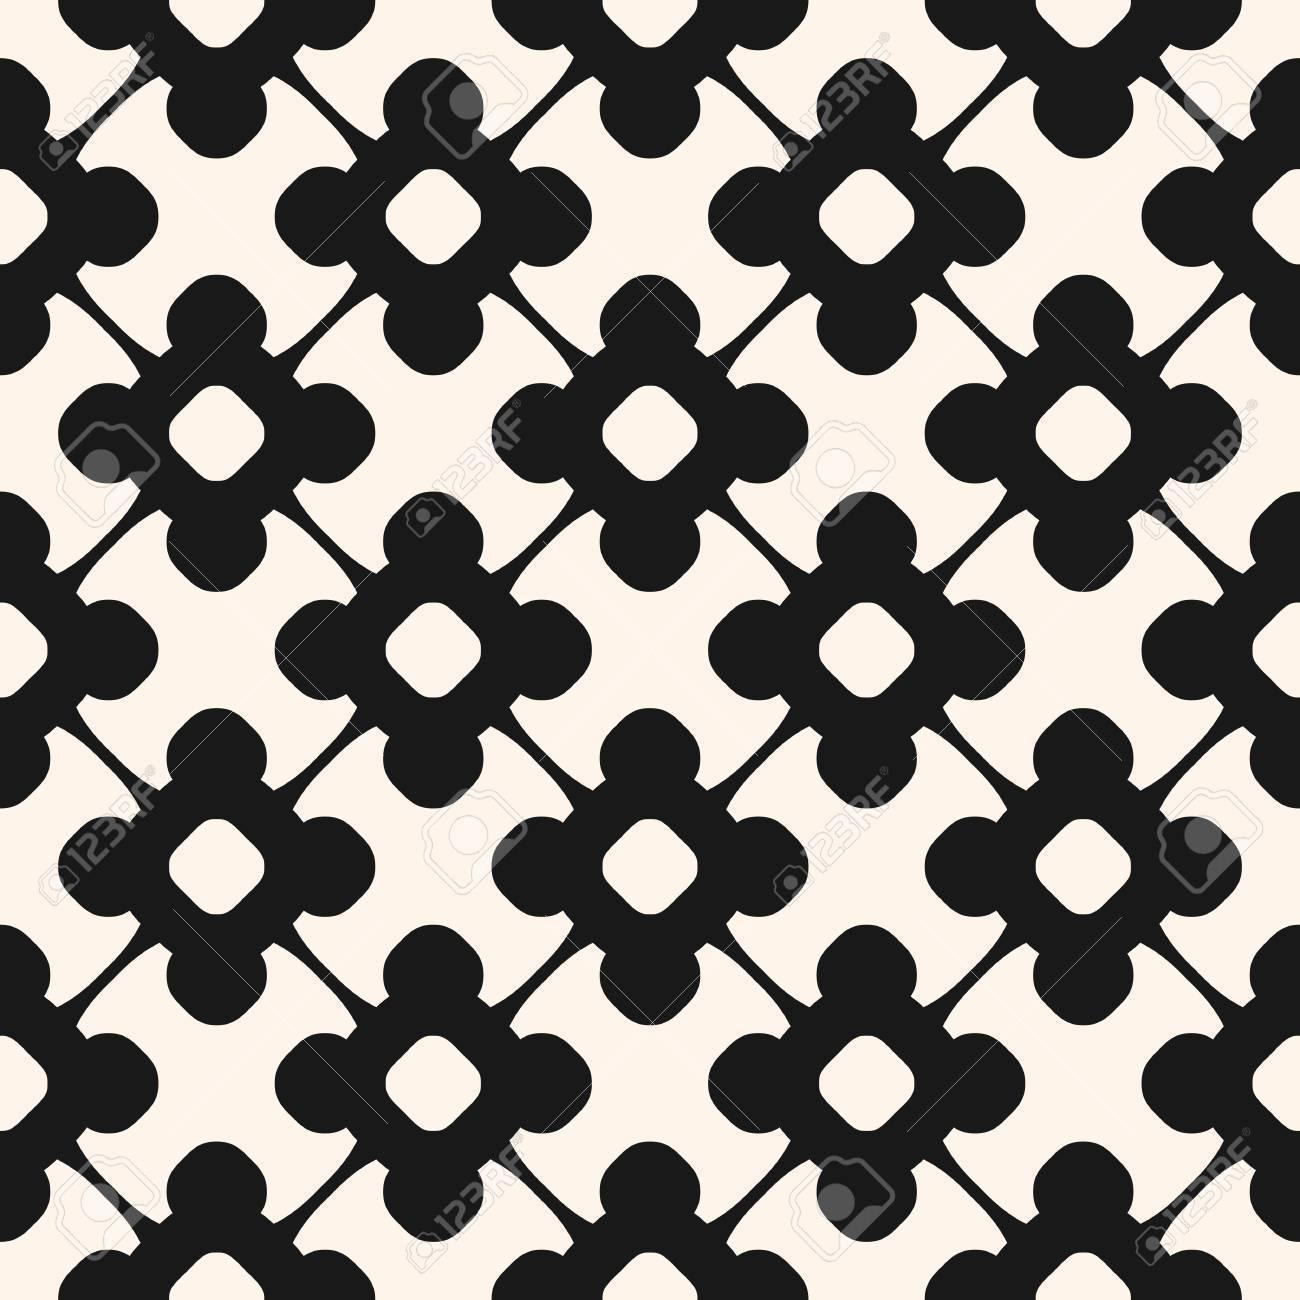 flower pattern vector seamless pattern floral ornamental rh 123rf com flower pattern vector background flower pattern vector black and white